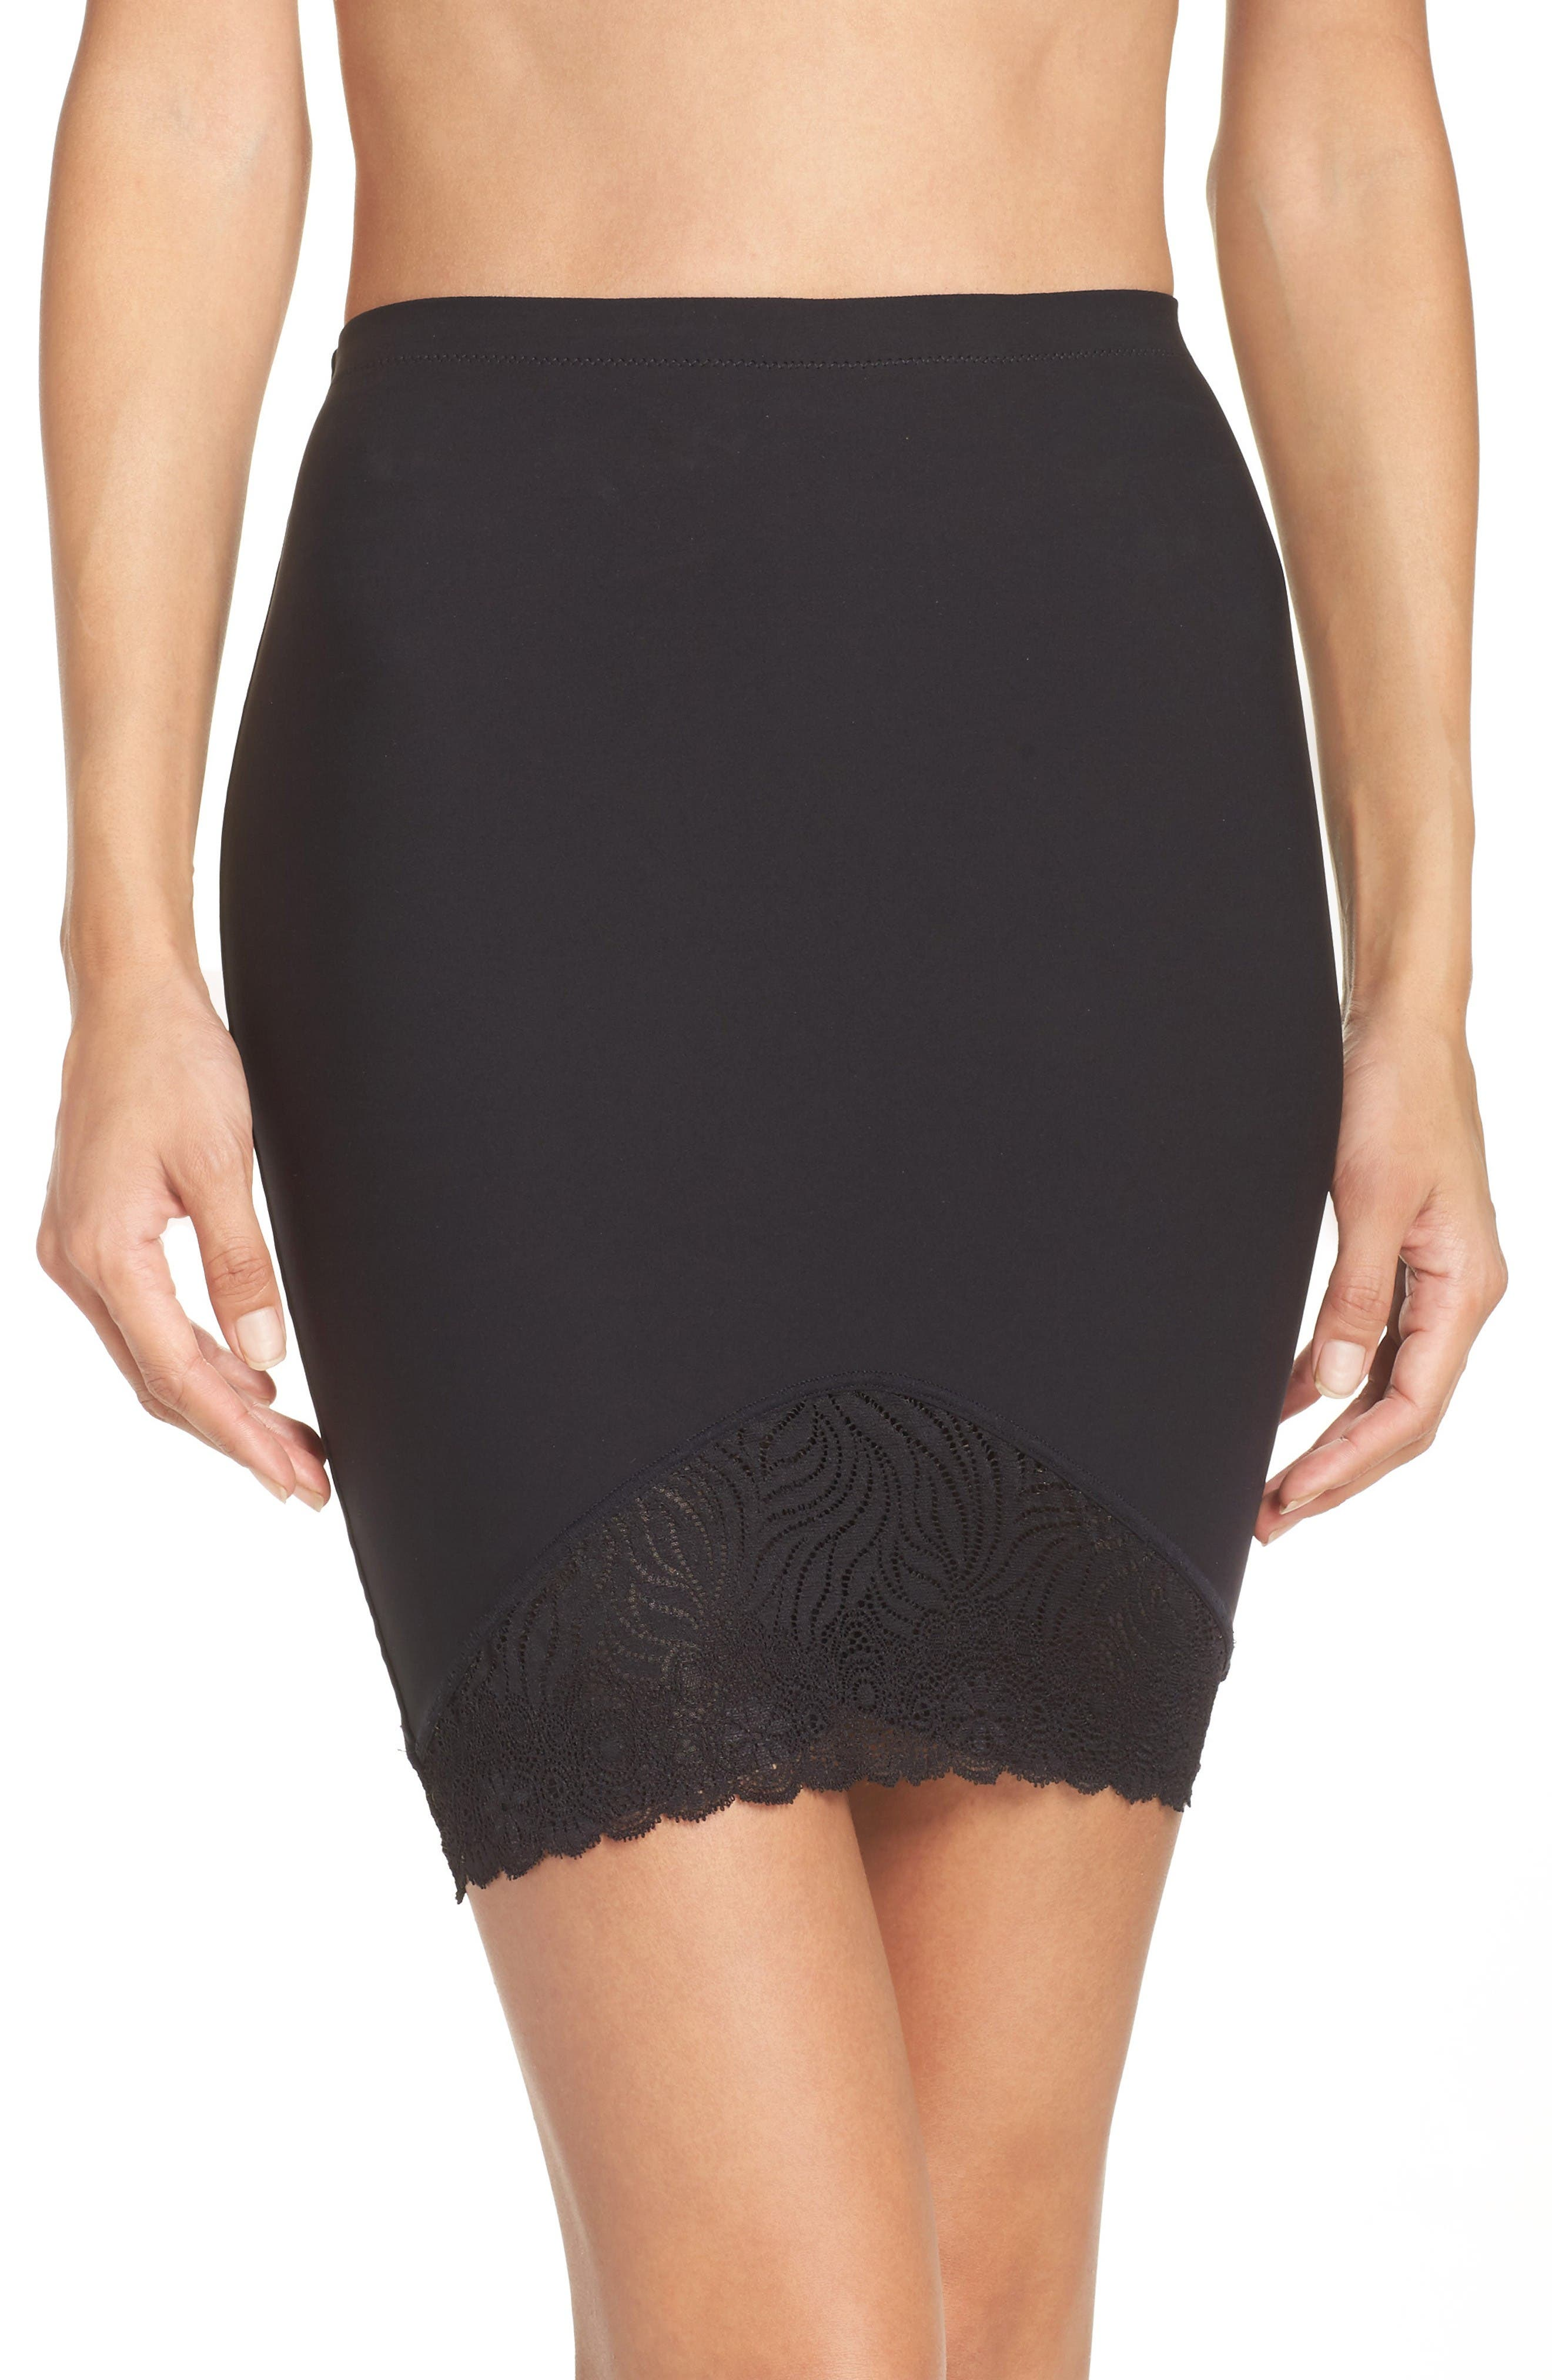 Top Model High Waist Skirt Shaper,                         Main,                         color, Black